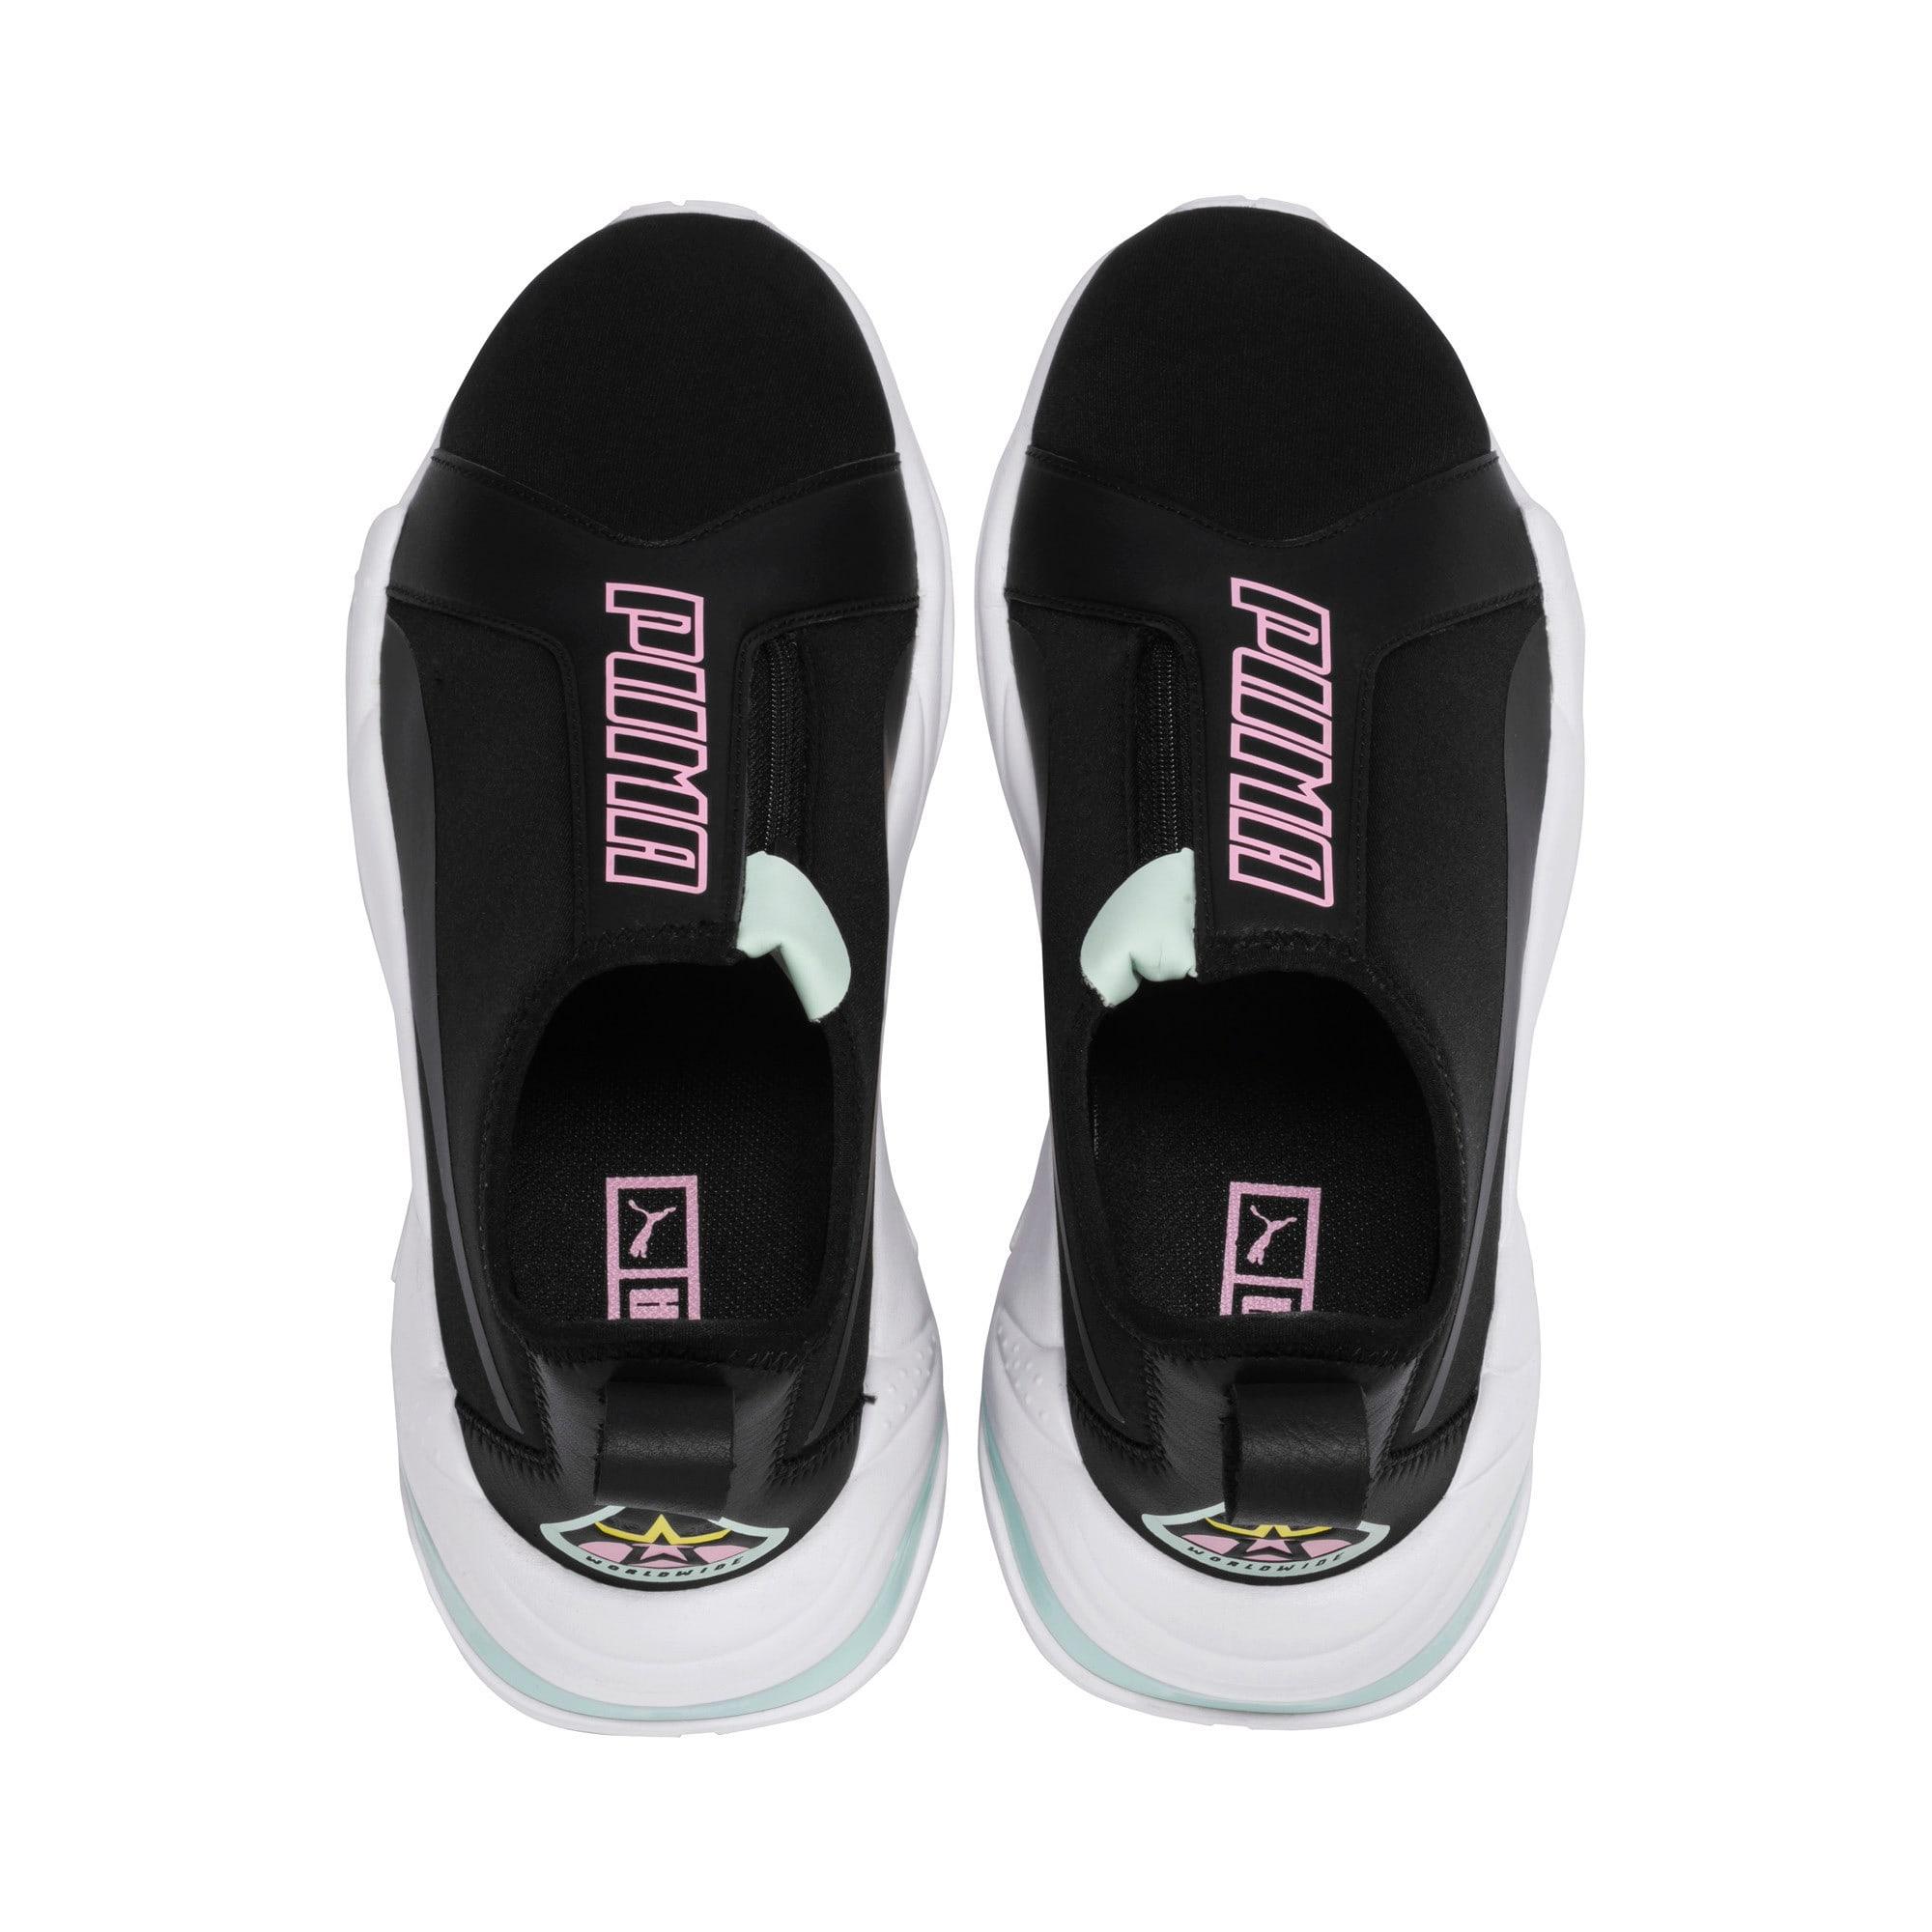 Miniatura 7 de Zapatos deportivos para mujer Thunder Trailblazer, Puma Black-Pale Pink, mediano